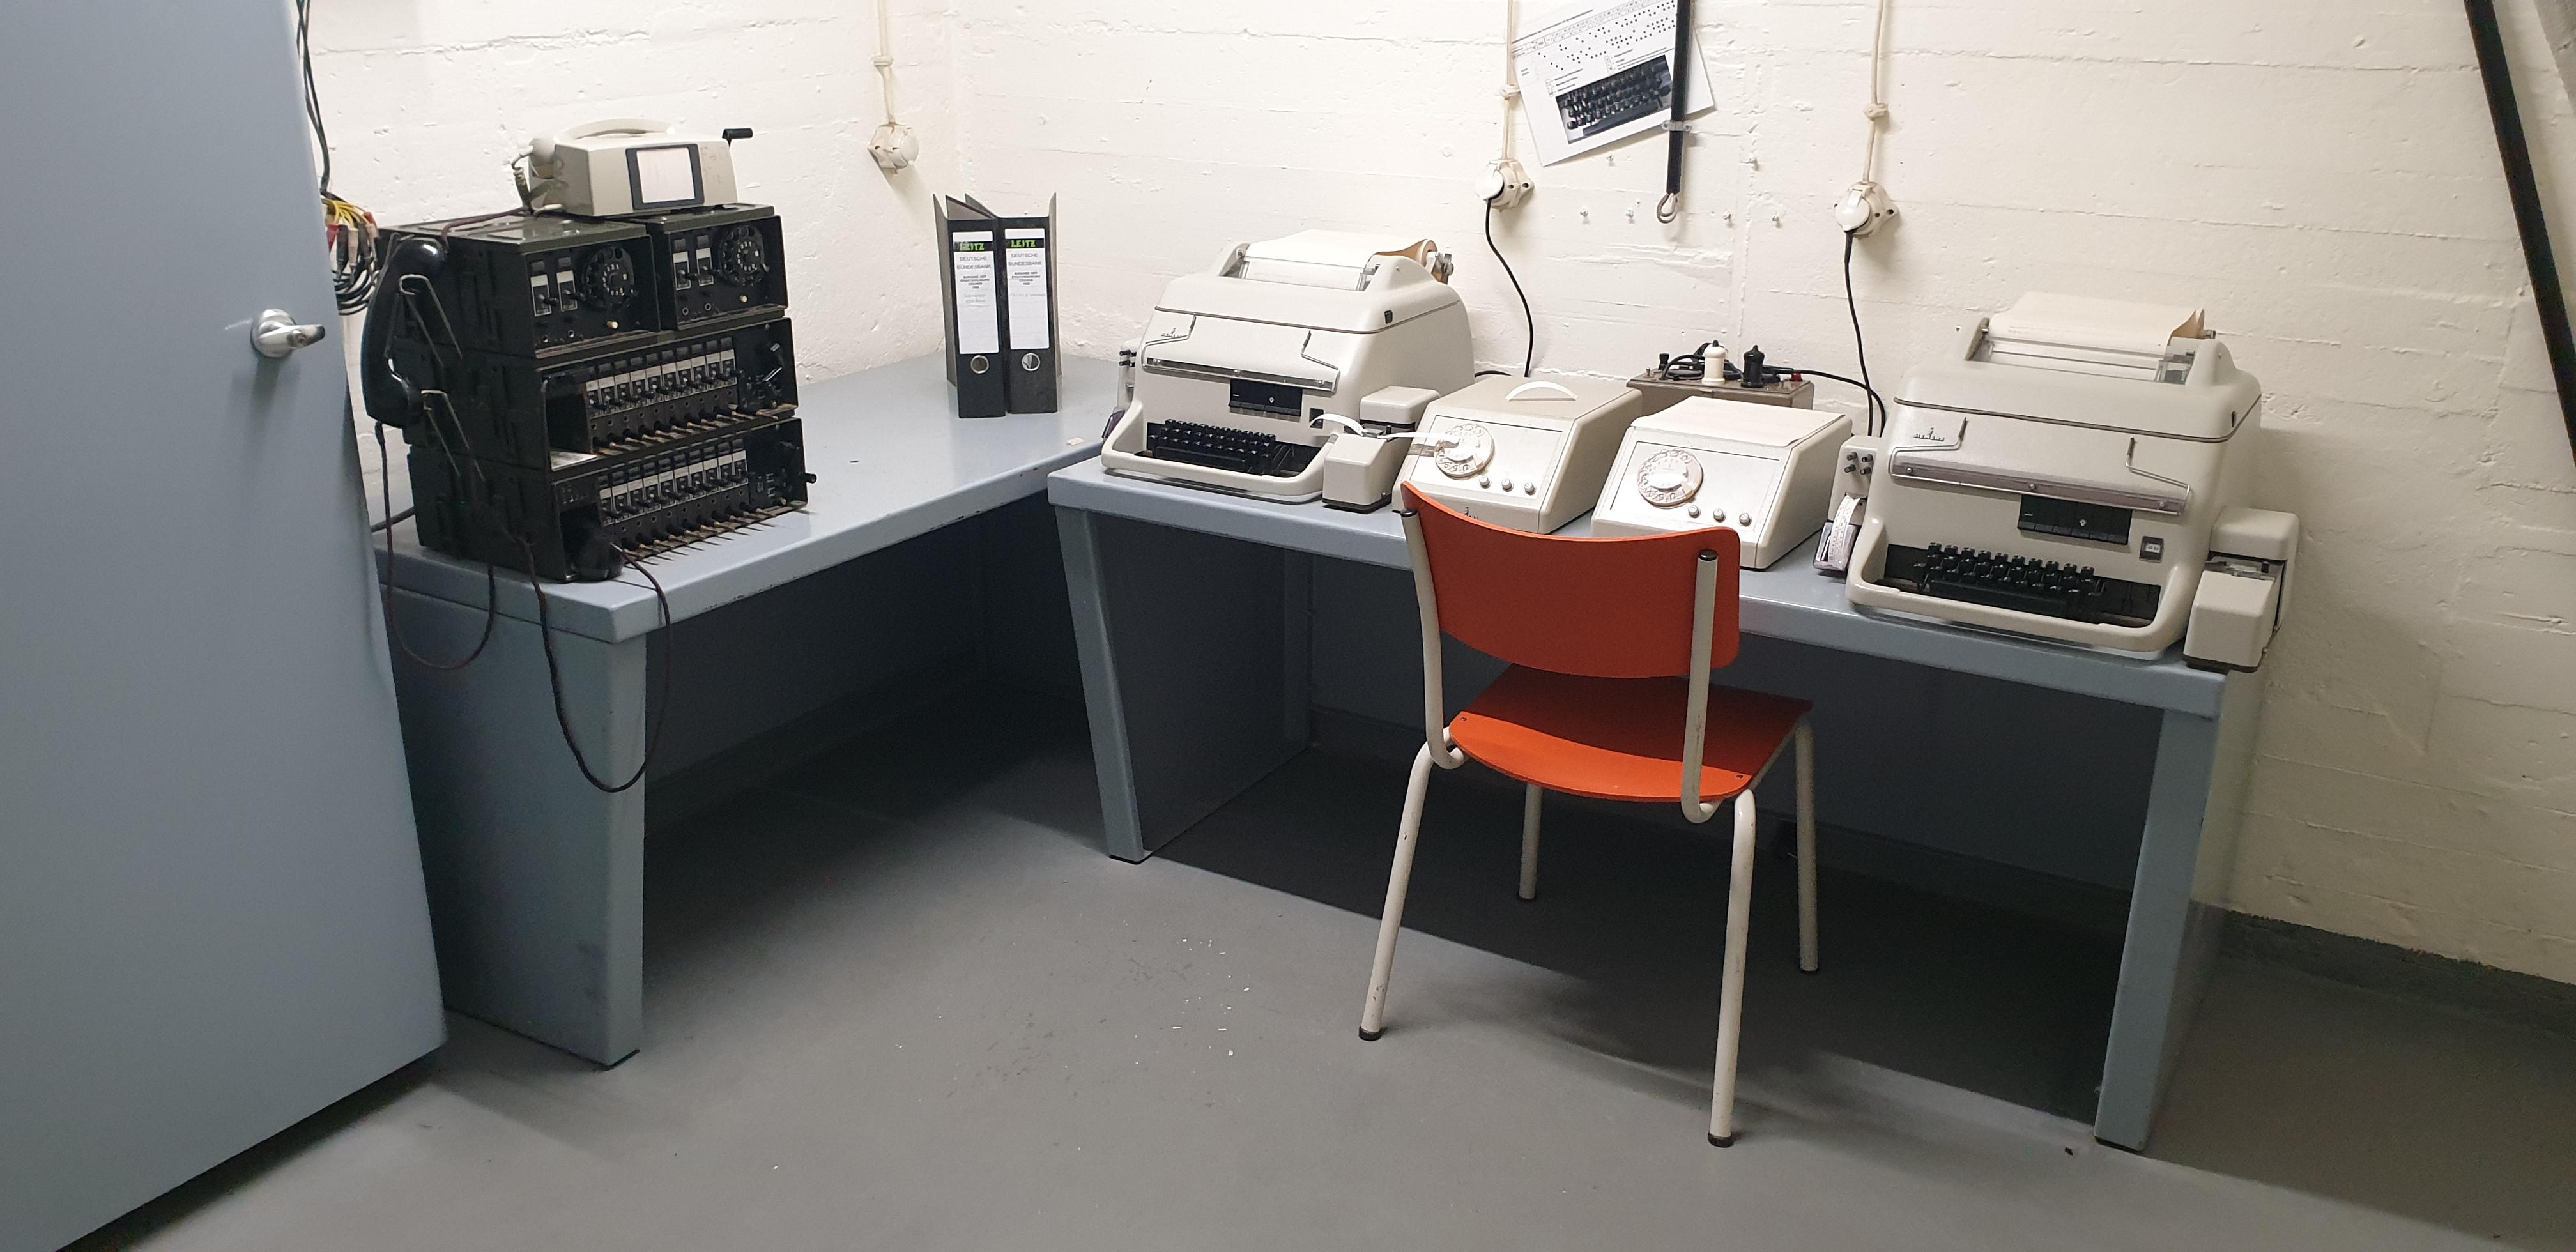 Telekommunikationszentrale im Bunker